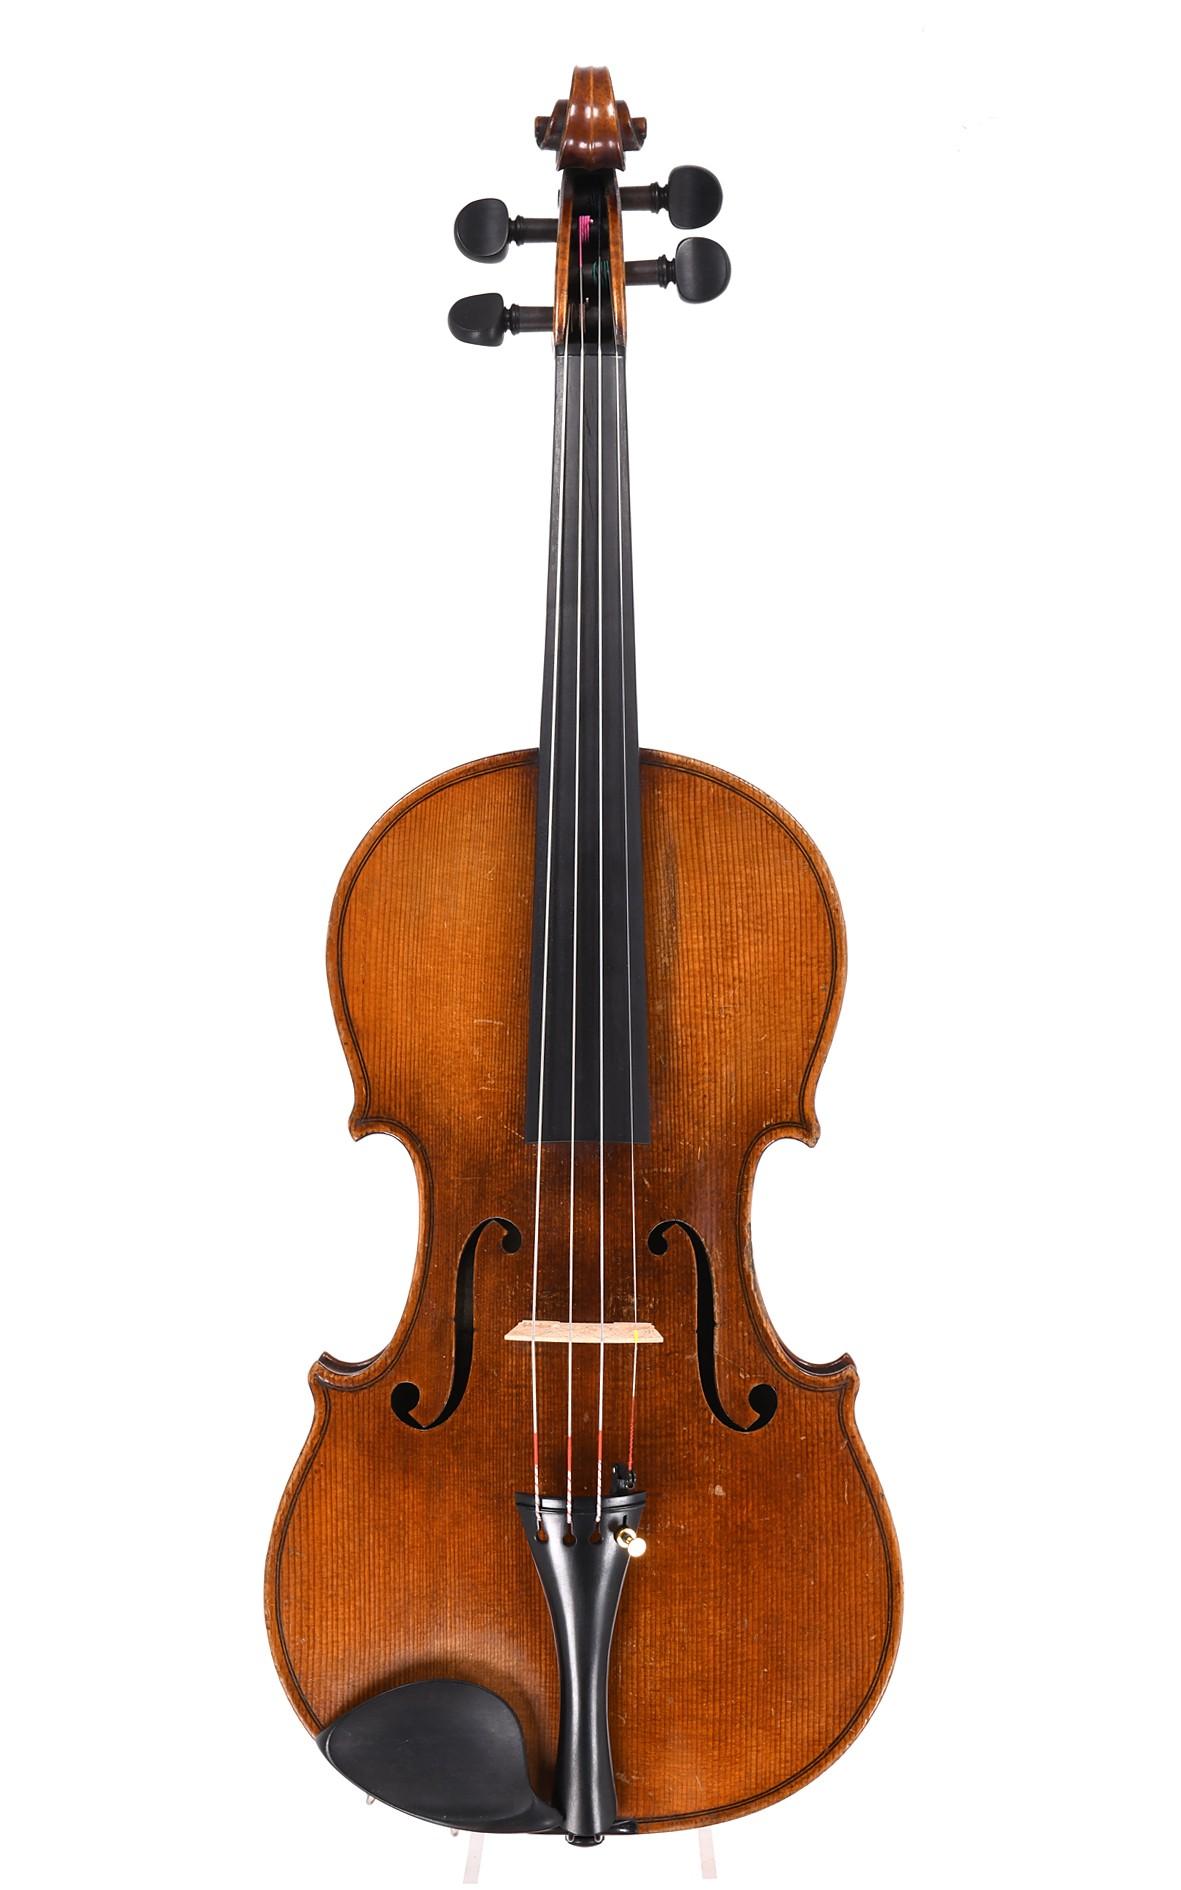 Antique French violin made around 1880